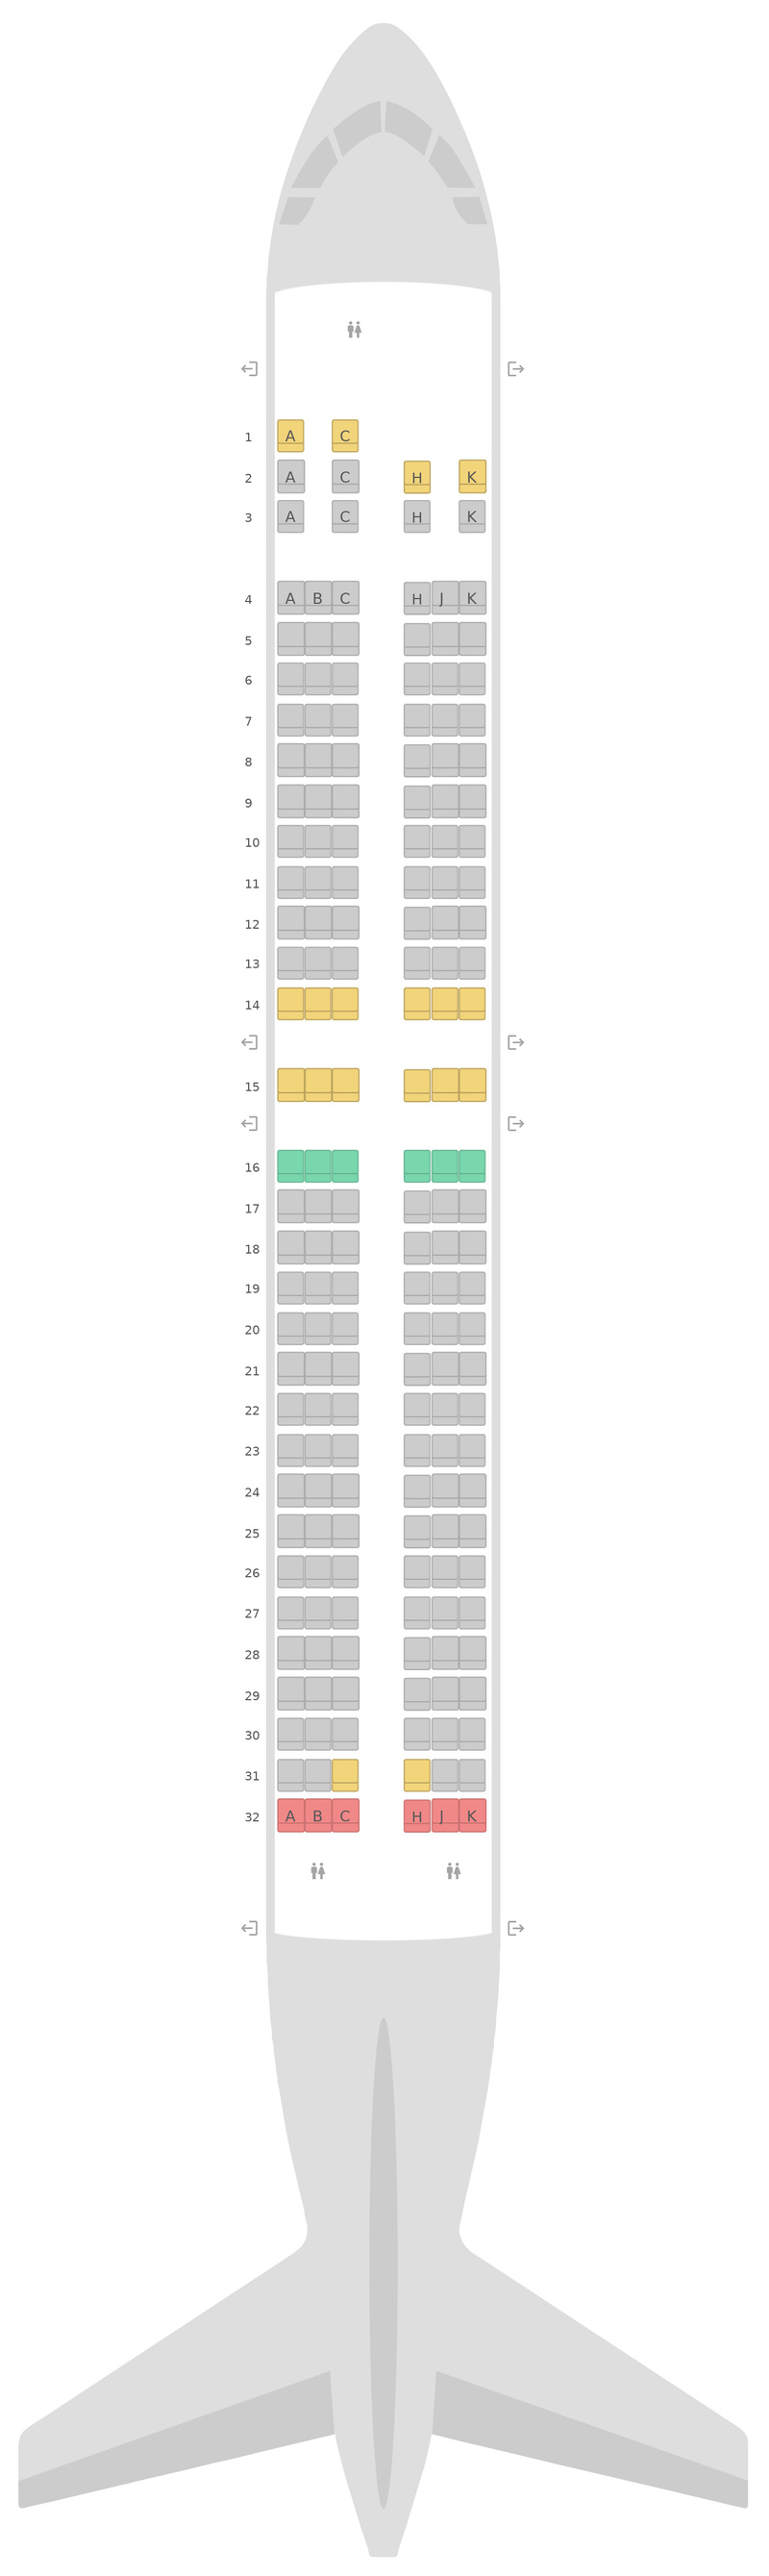 Схема салона Боинг 737-800 (738) 2 Class Air Transat